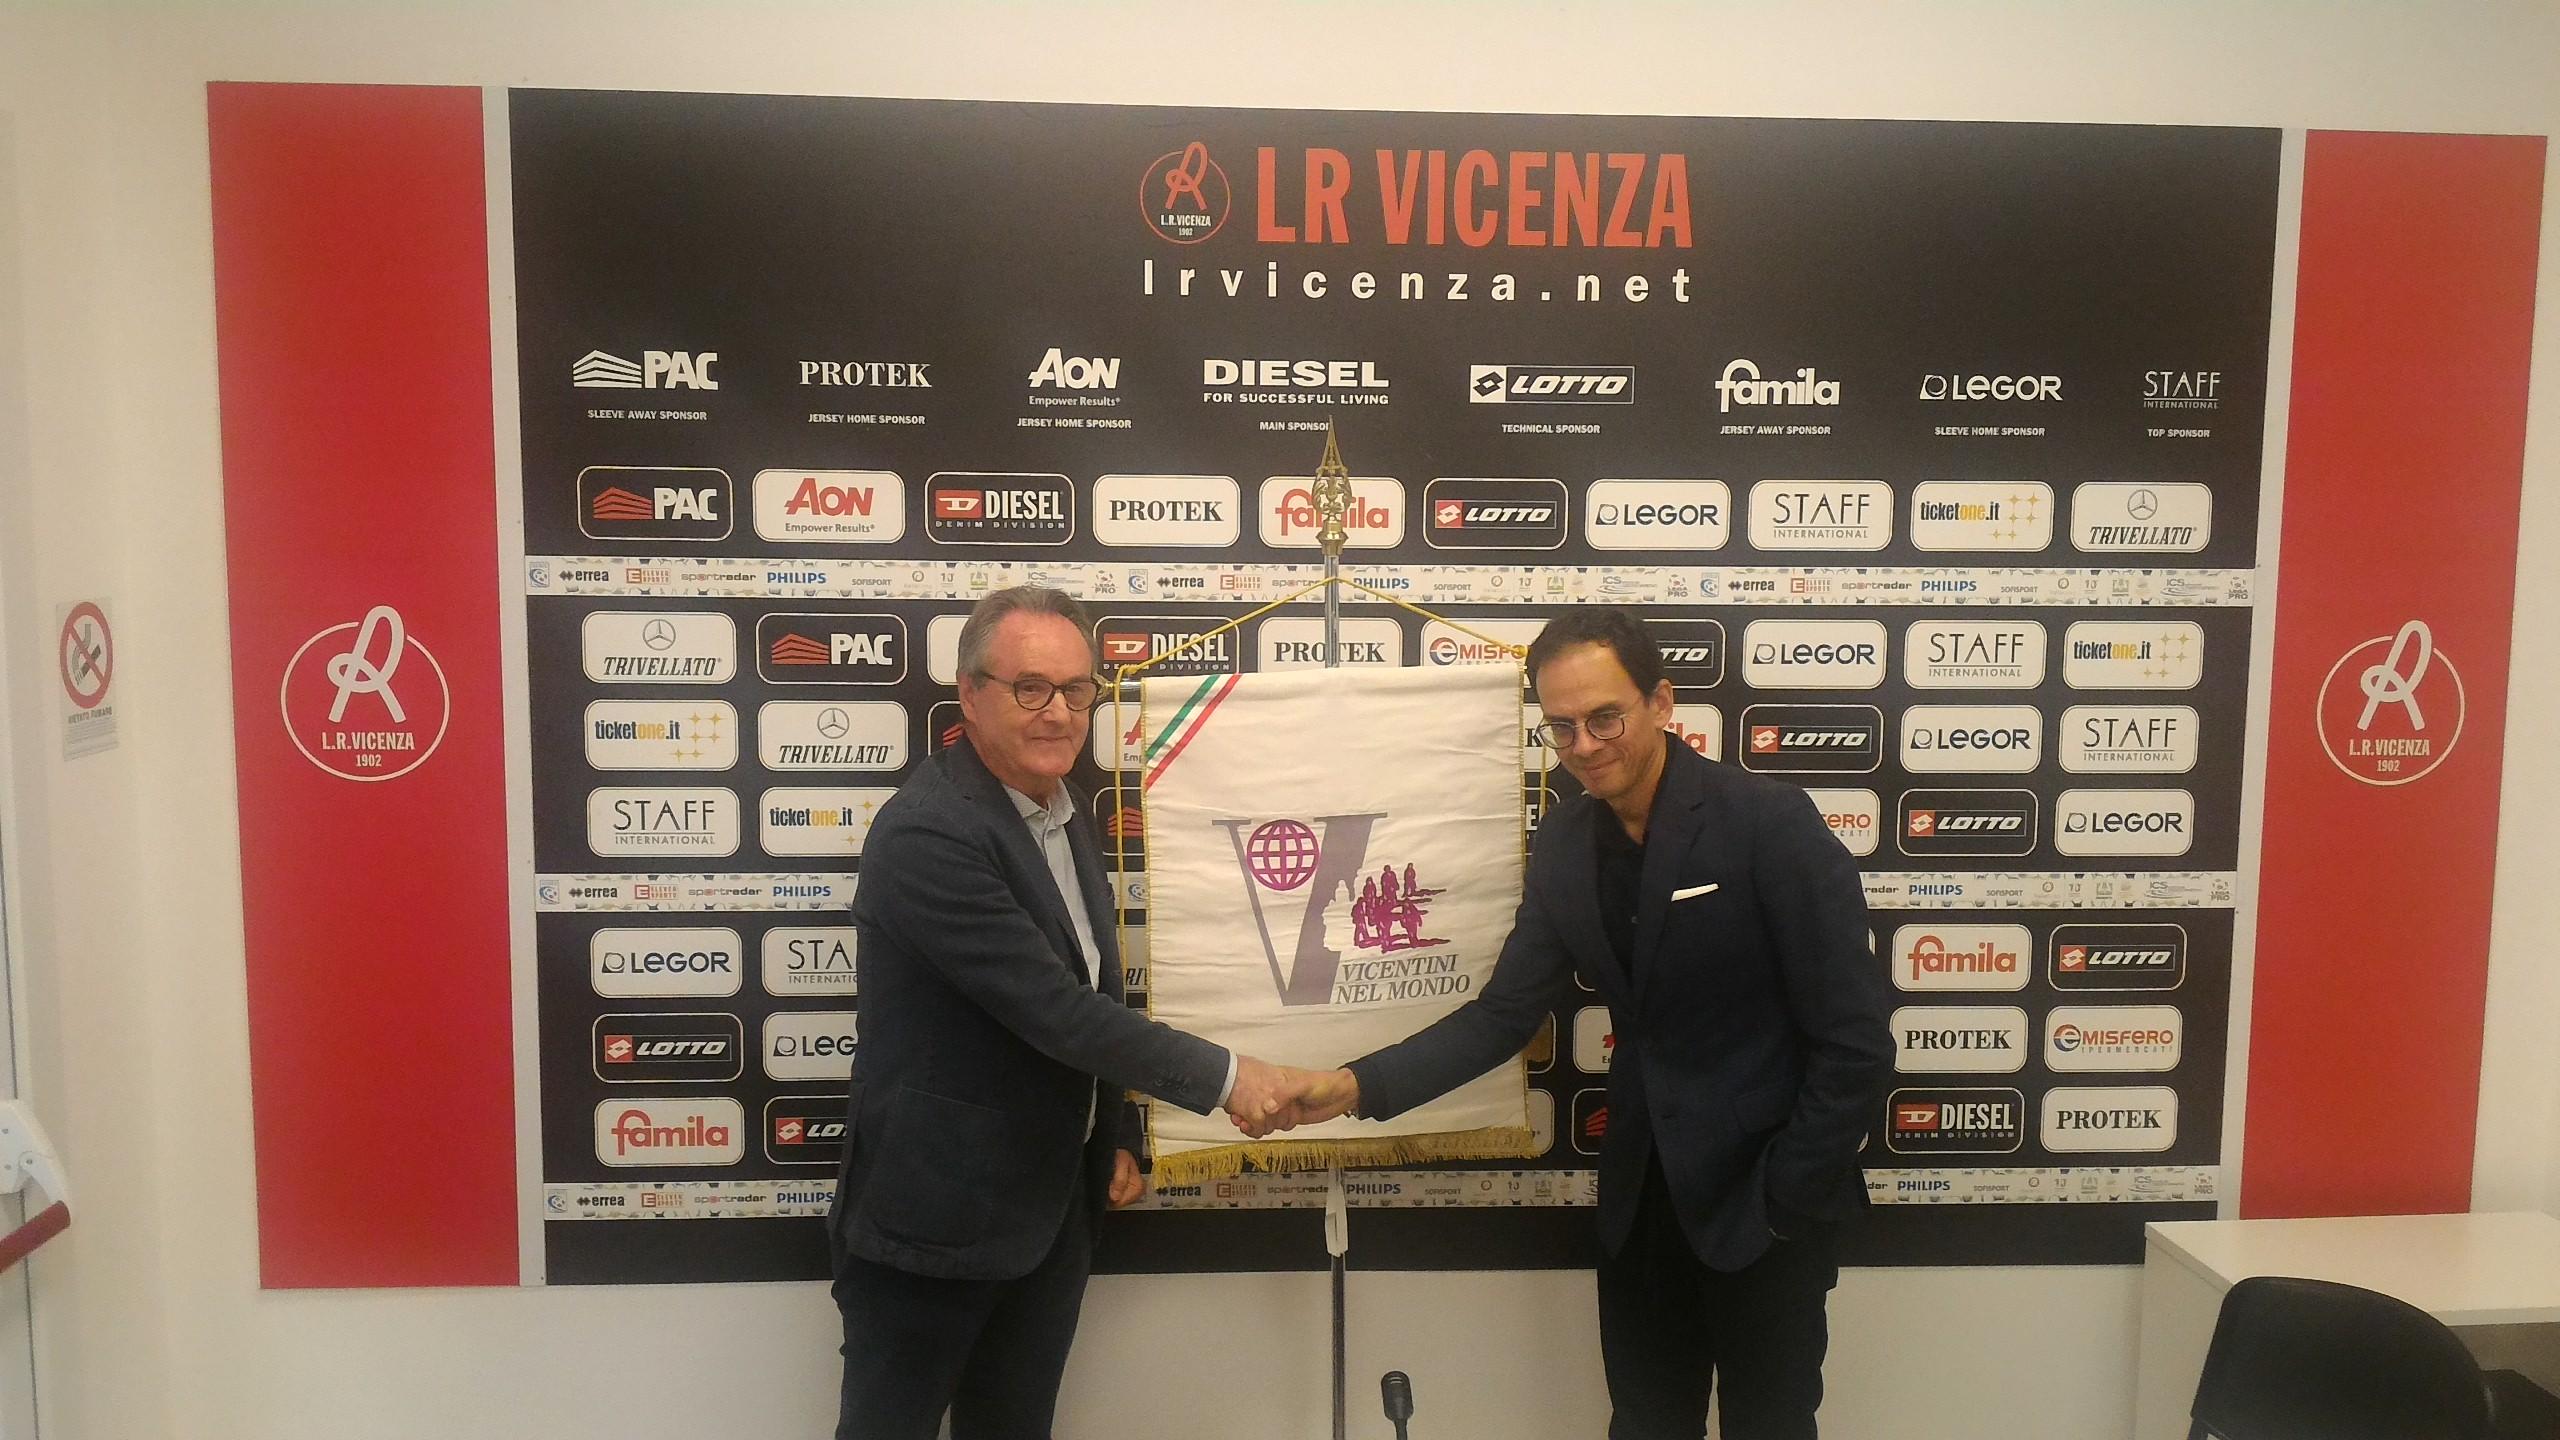 LR Vicenza \